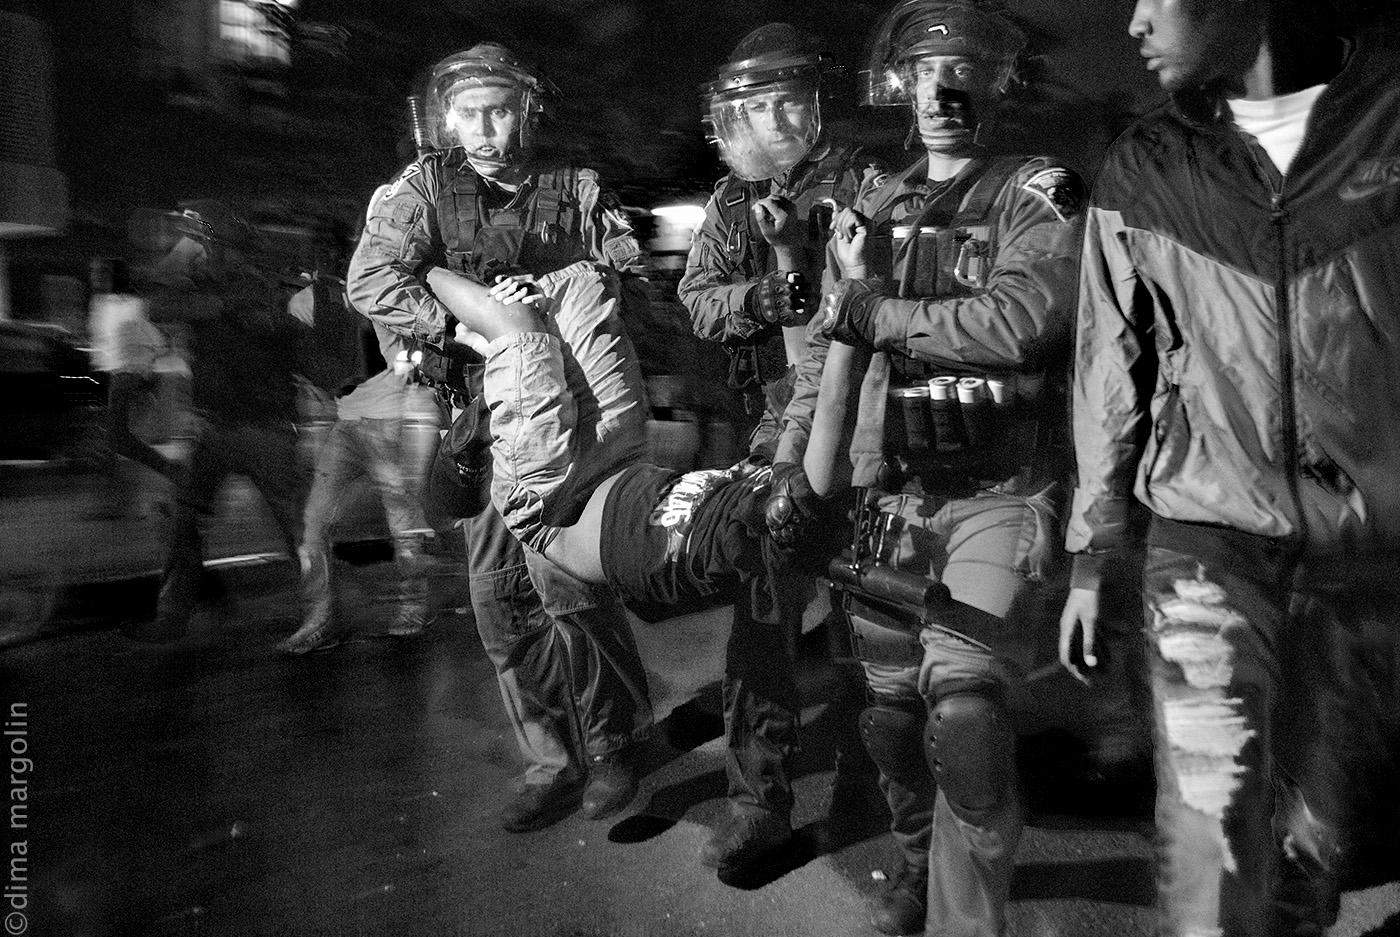 Black night in Tel Aviv – לילה שחור בתל אביב